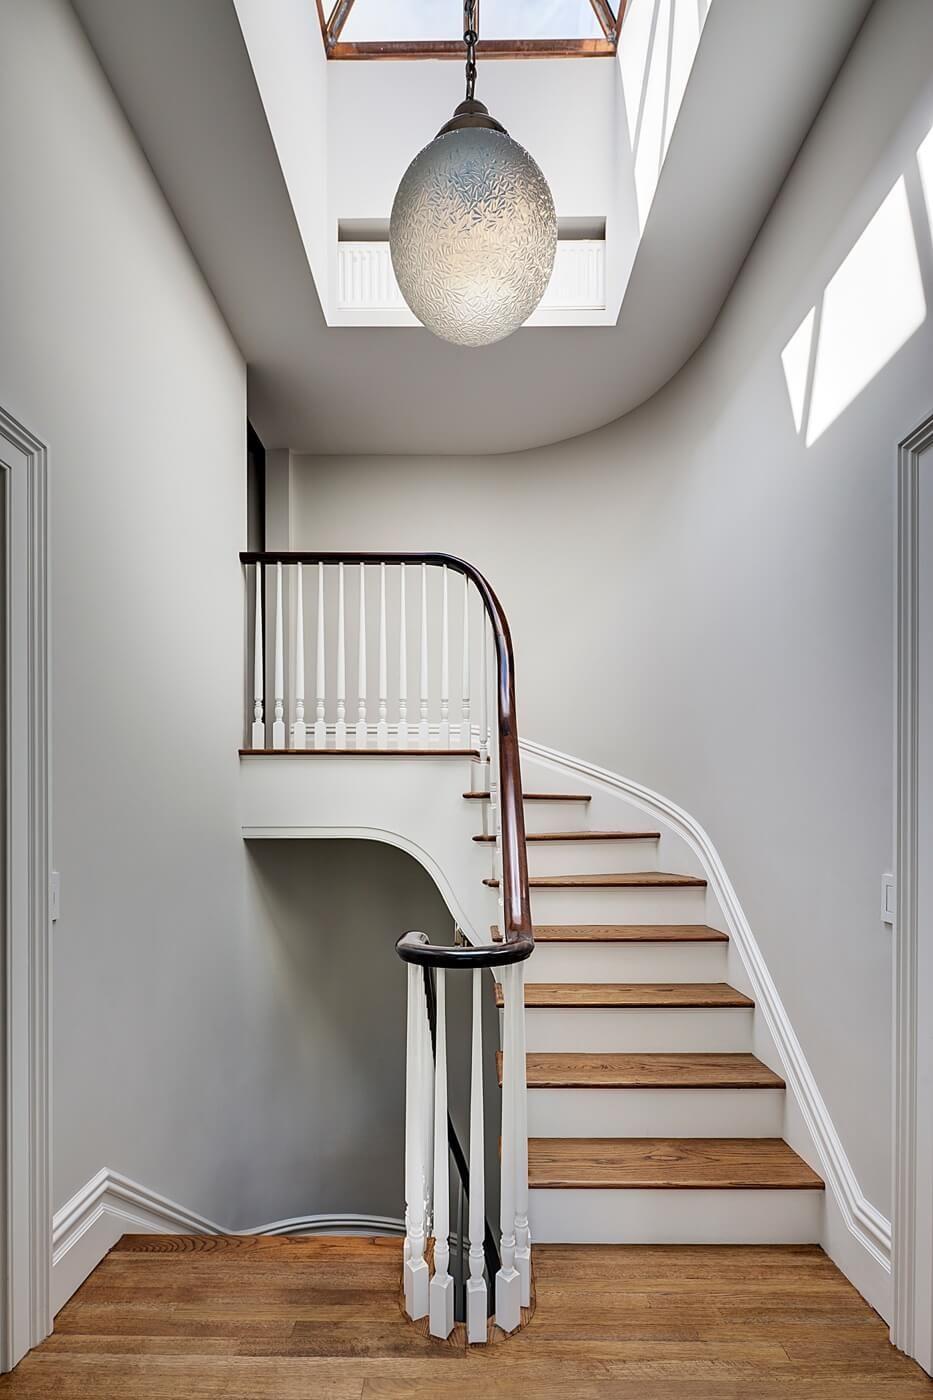 Interior stair railing height decorative countertop support brackets